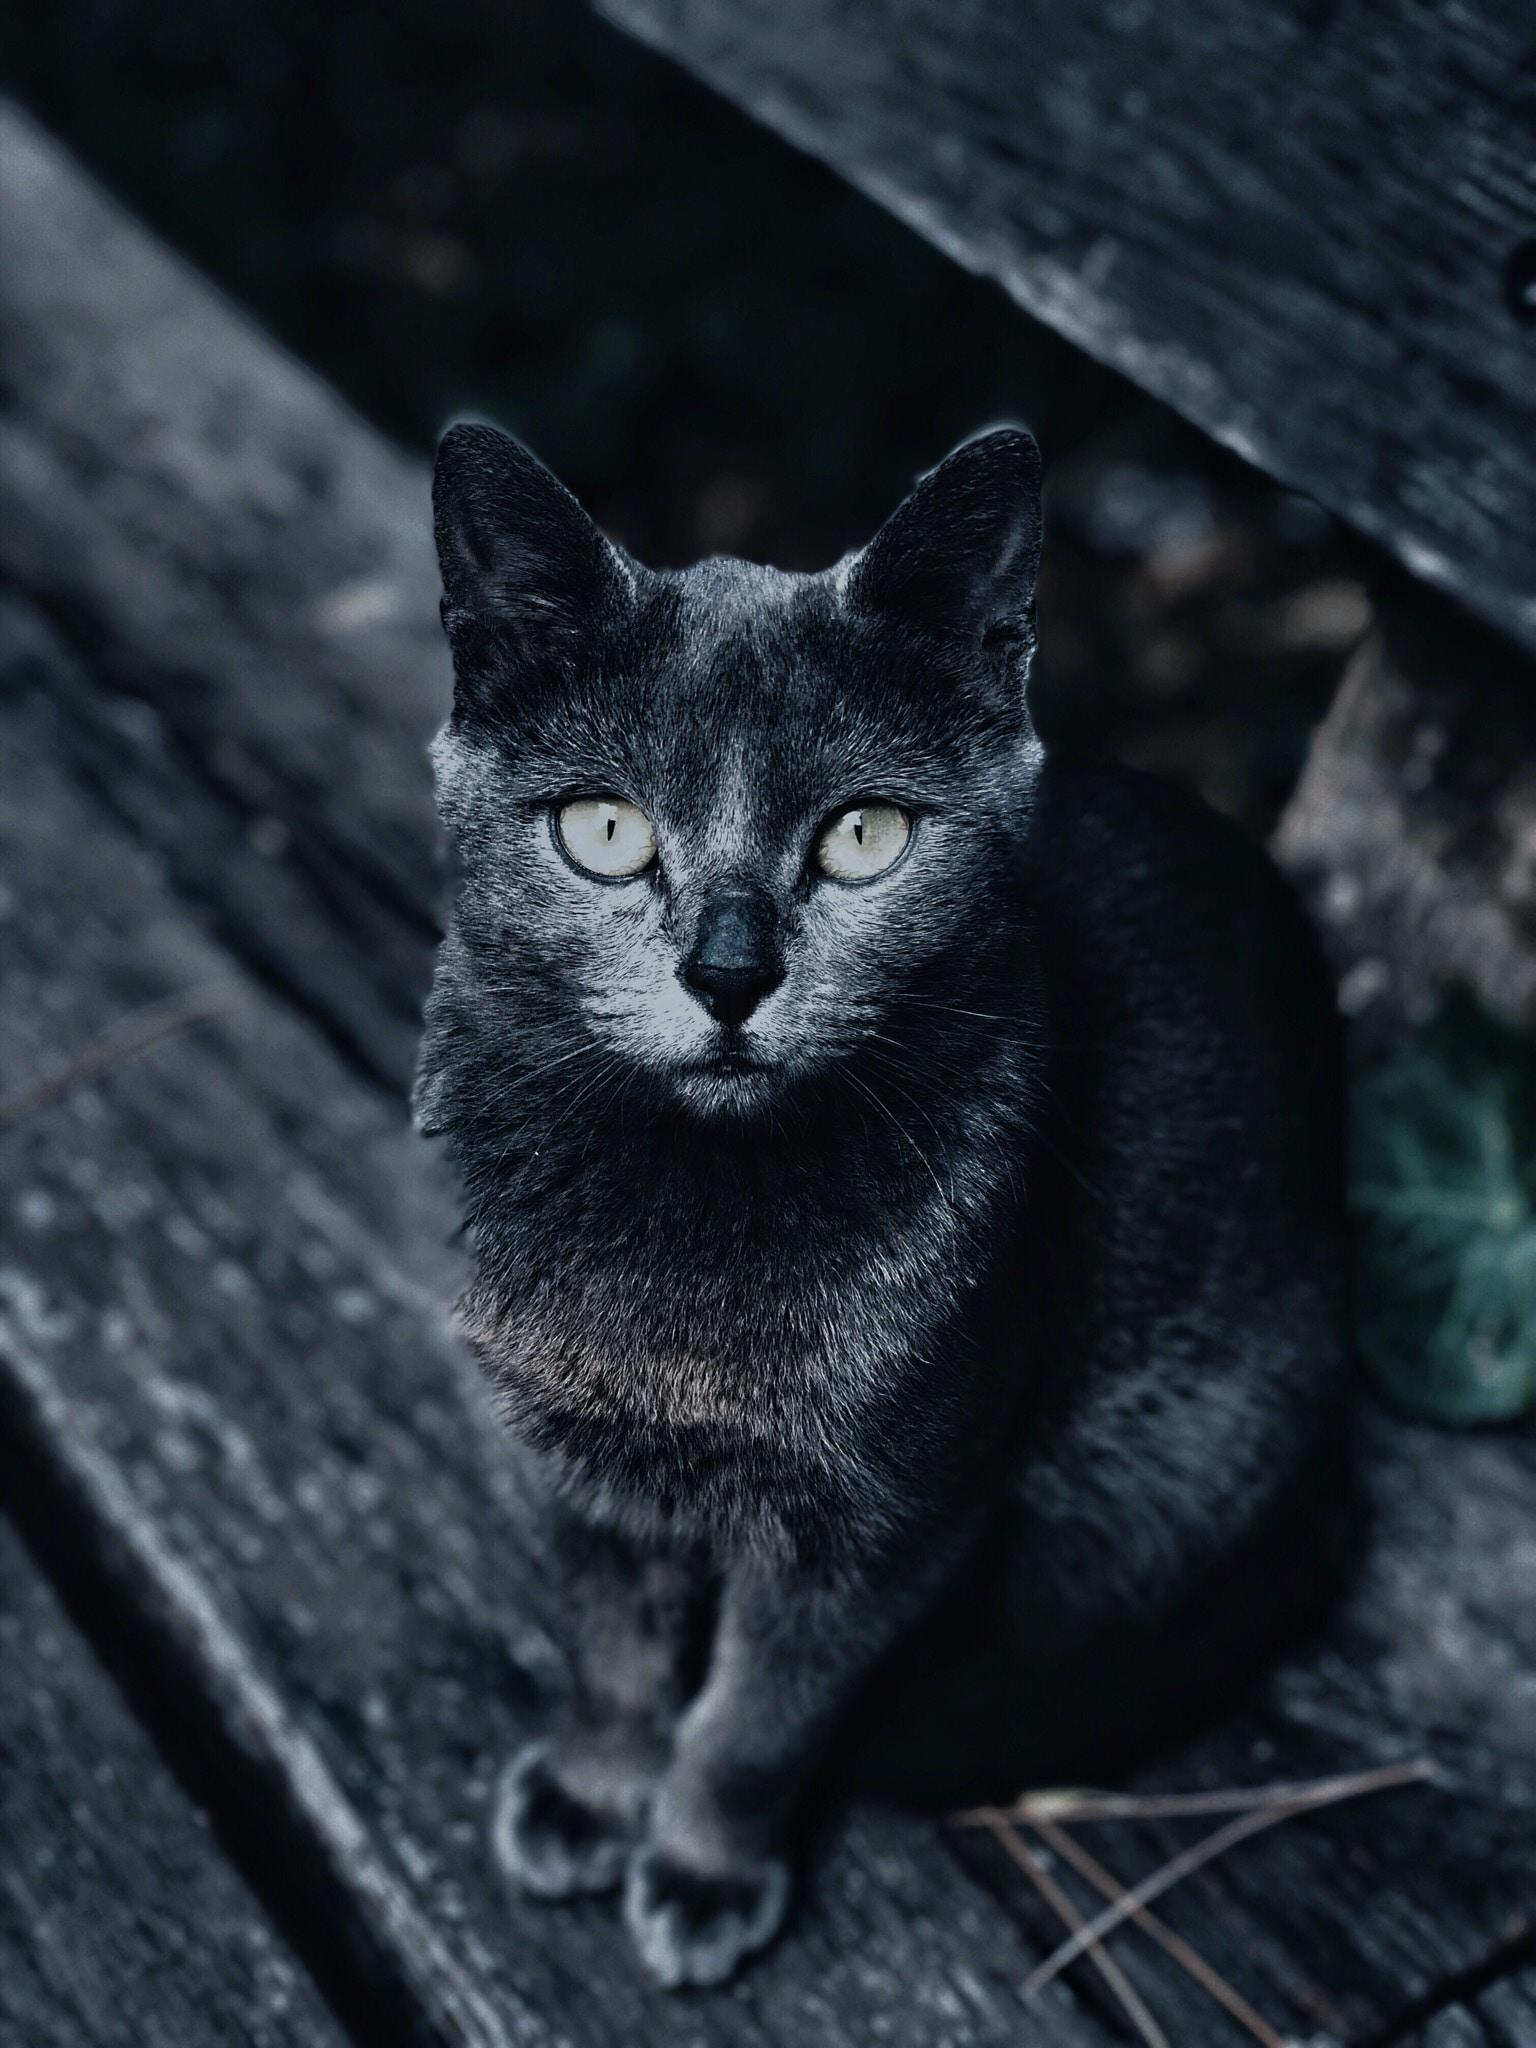 Stray Cat animal stories